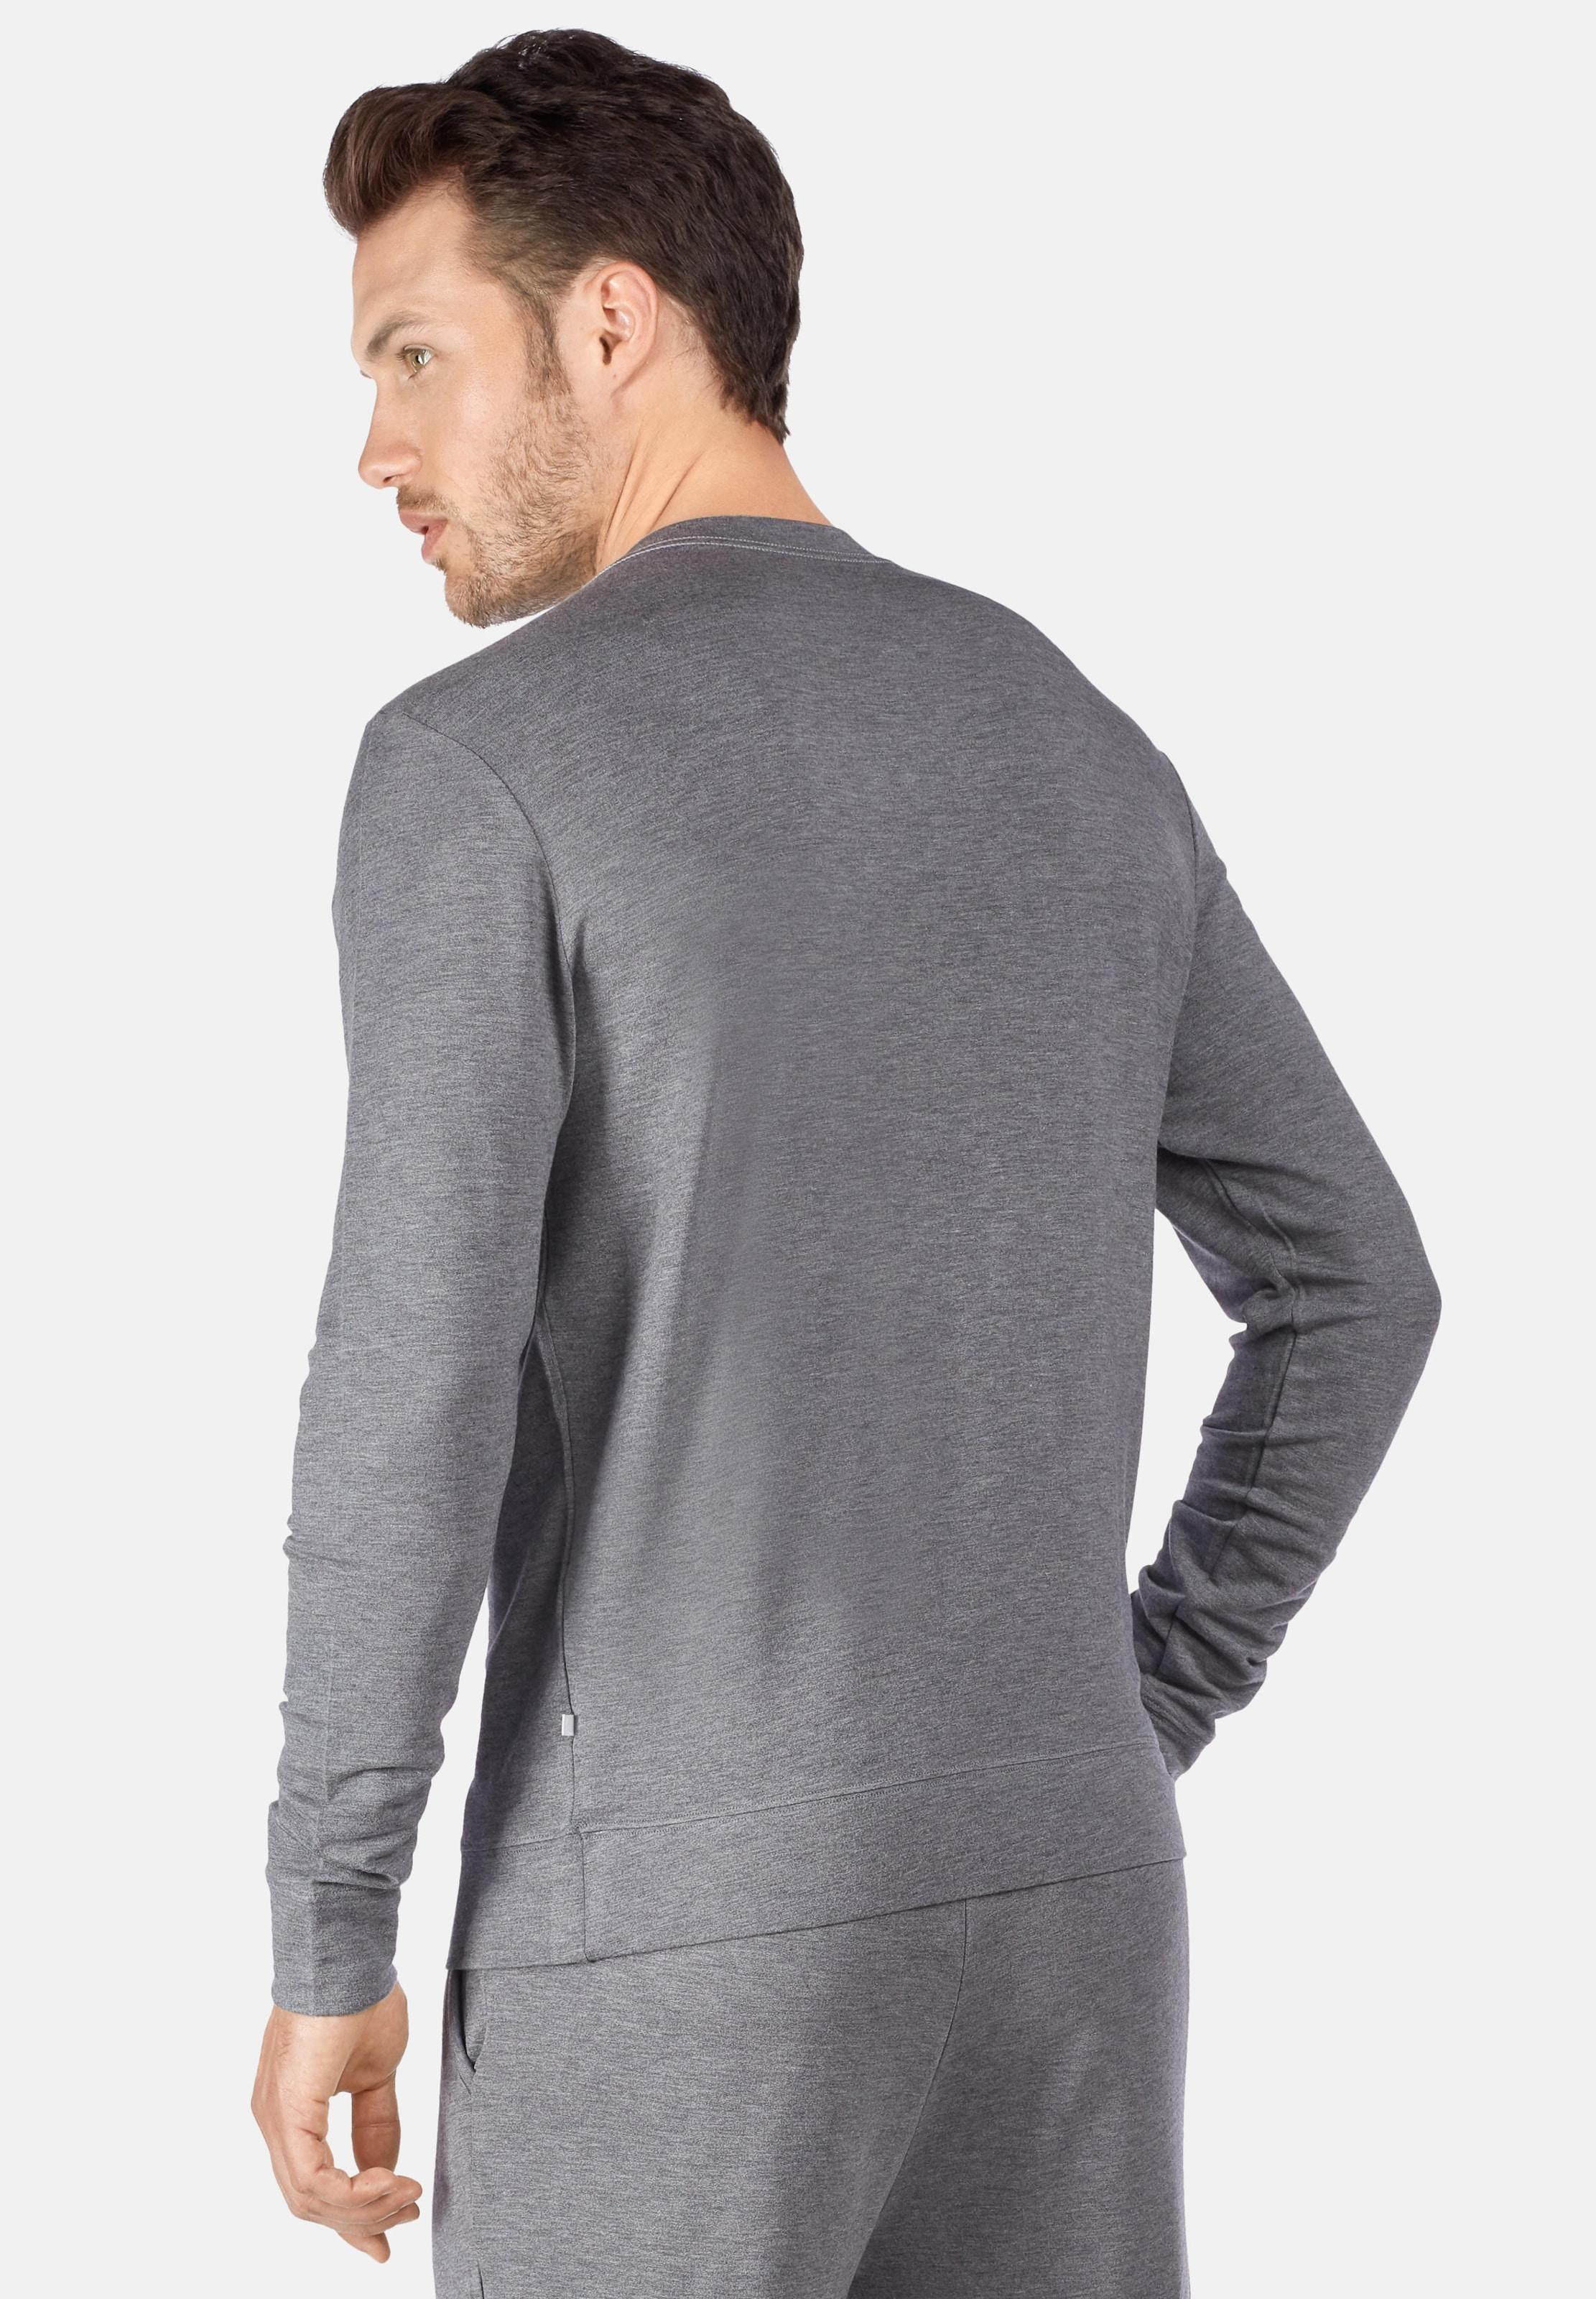 Hours Im Sweatshirt Huber Lounge Lässigen Grau In Look 24 Ygfvby76